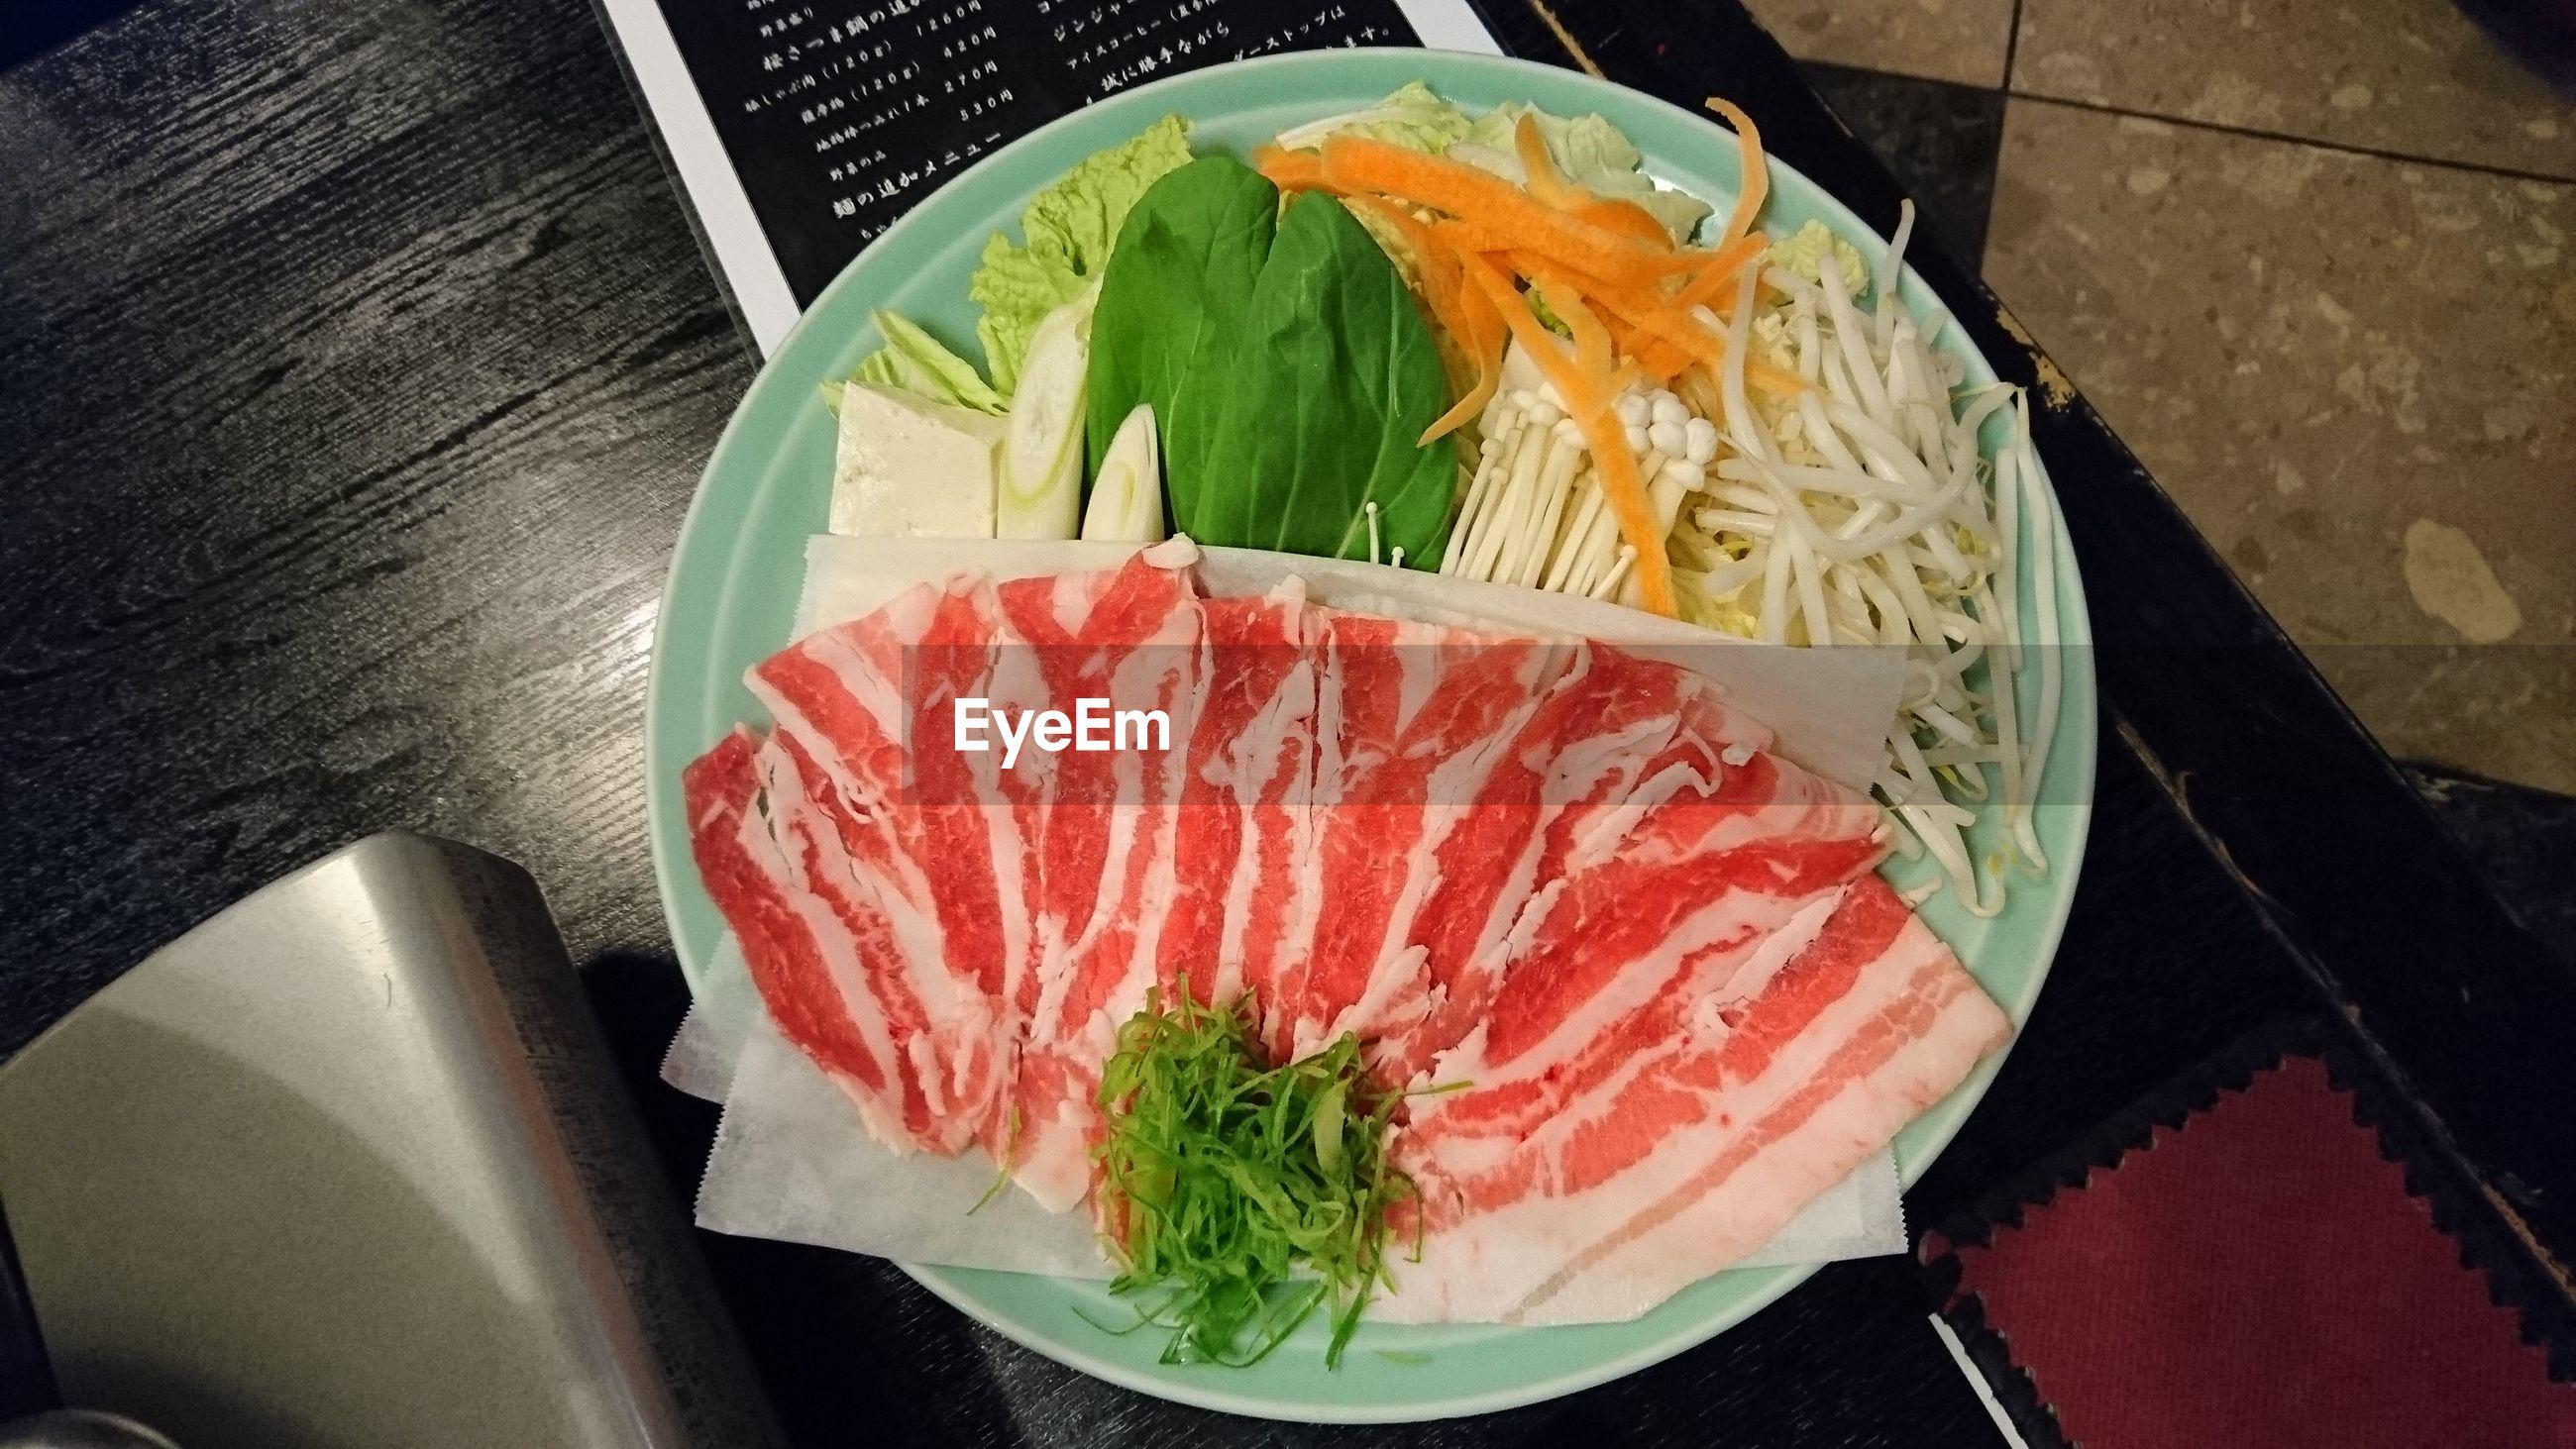 Directly above shot of shabu shabu in plate on table